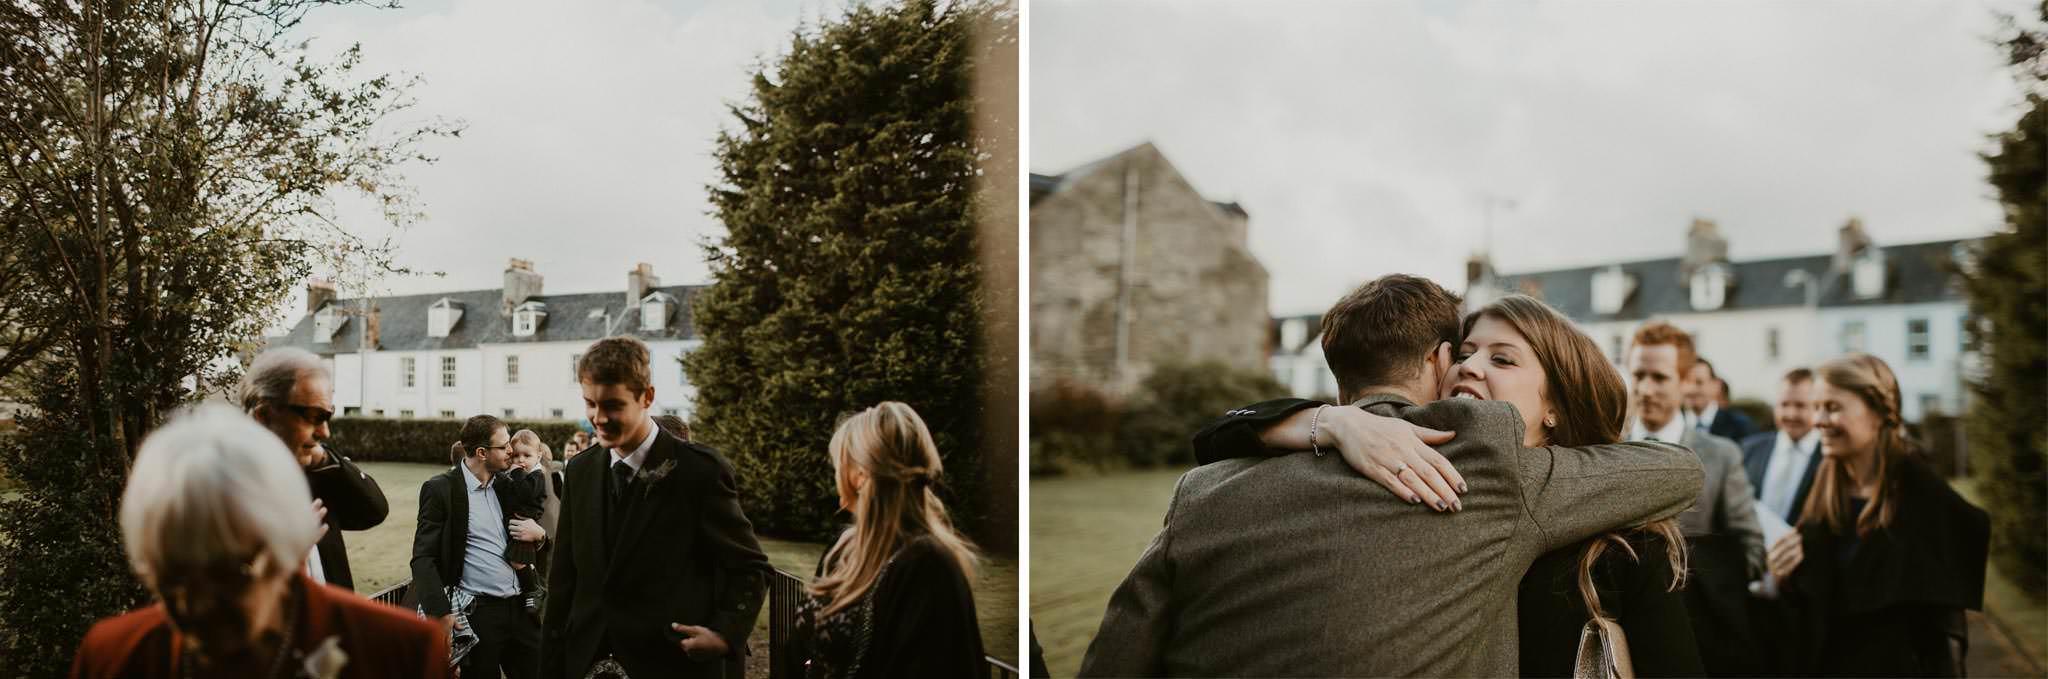 crear-wedding-photographer-029